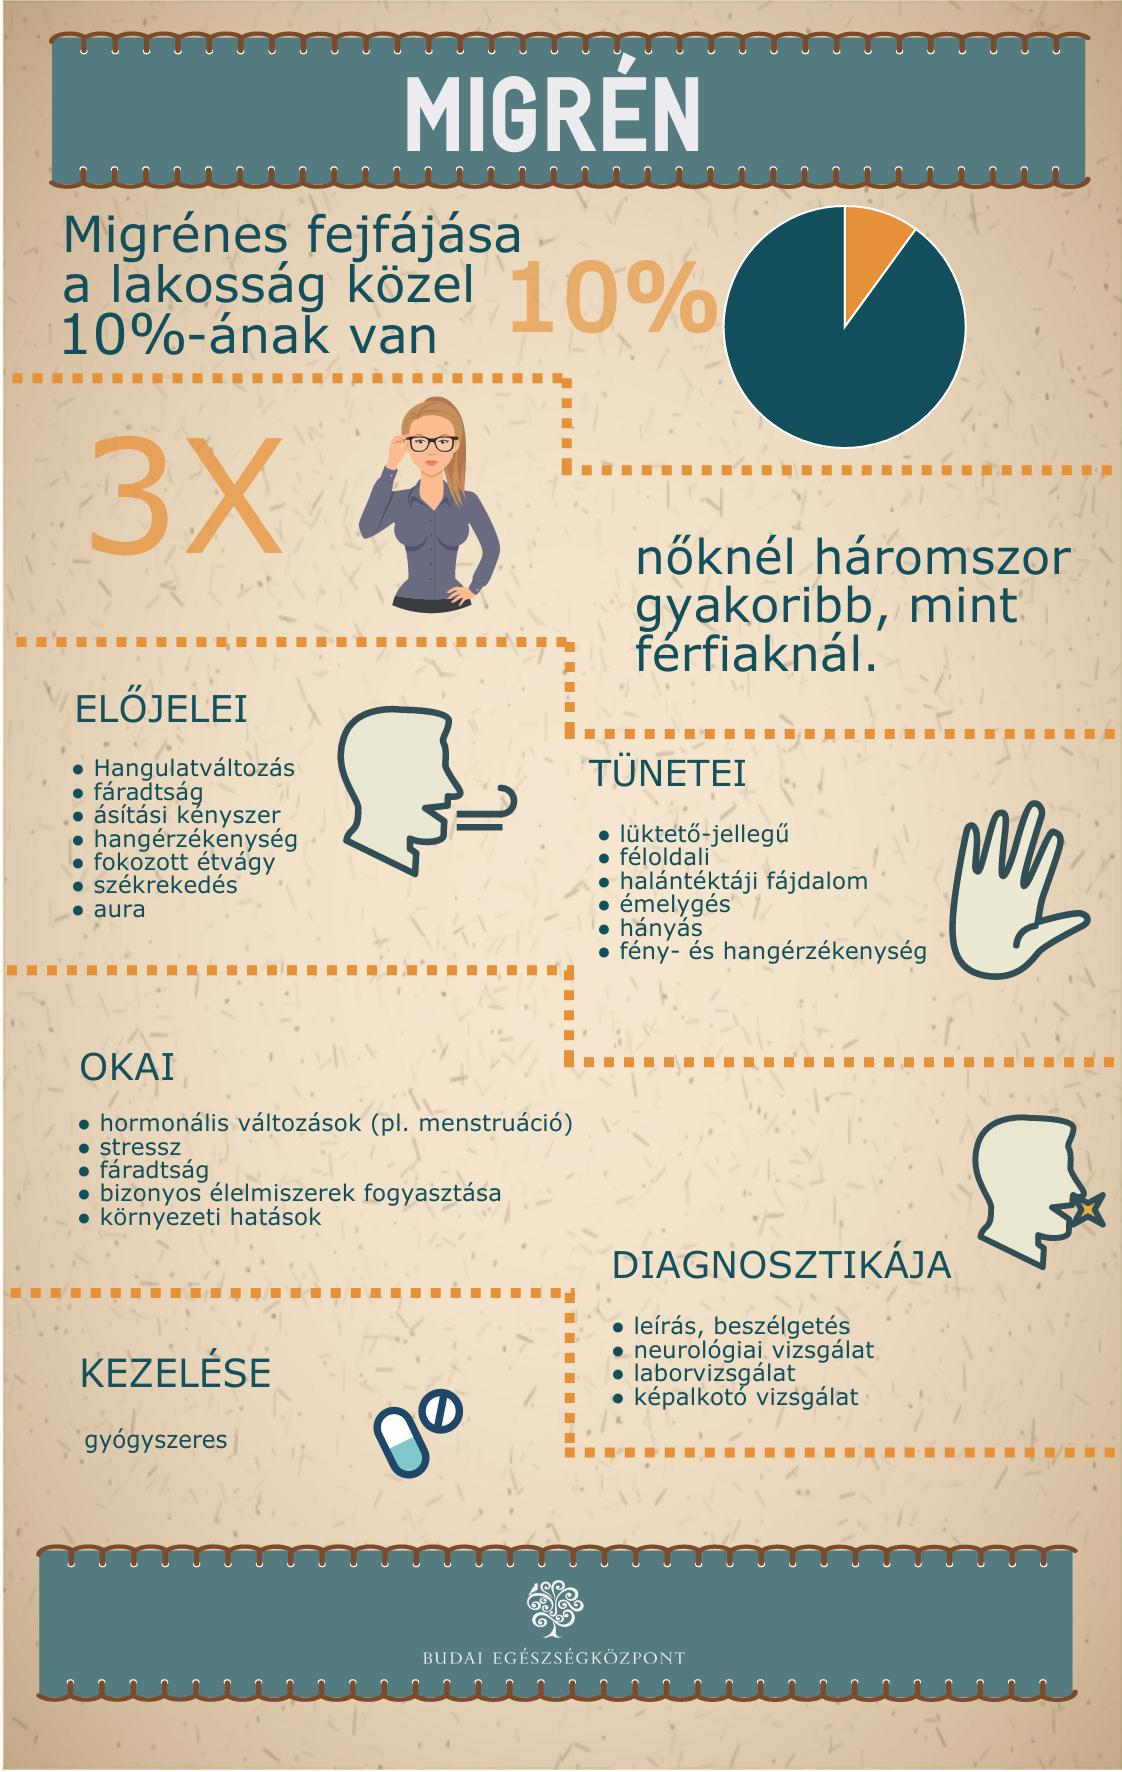 bhc-migren-infografika